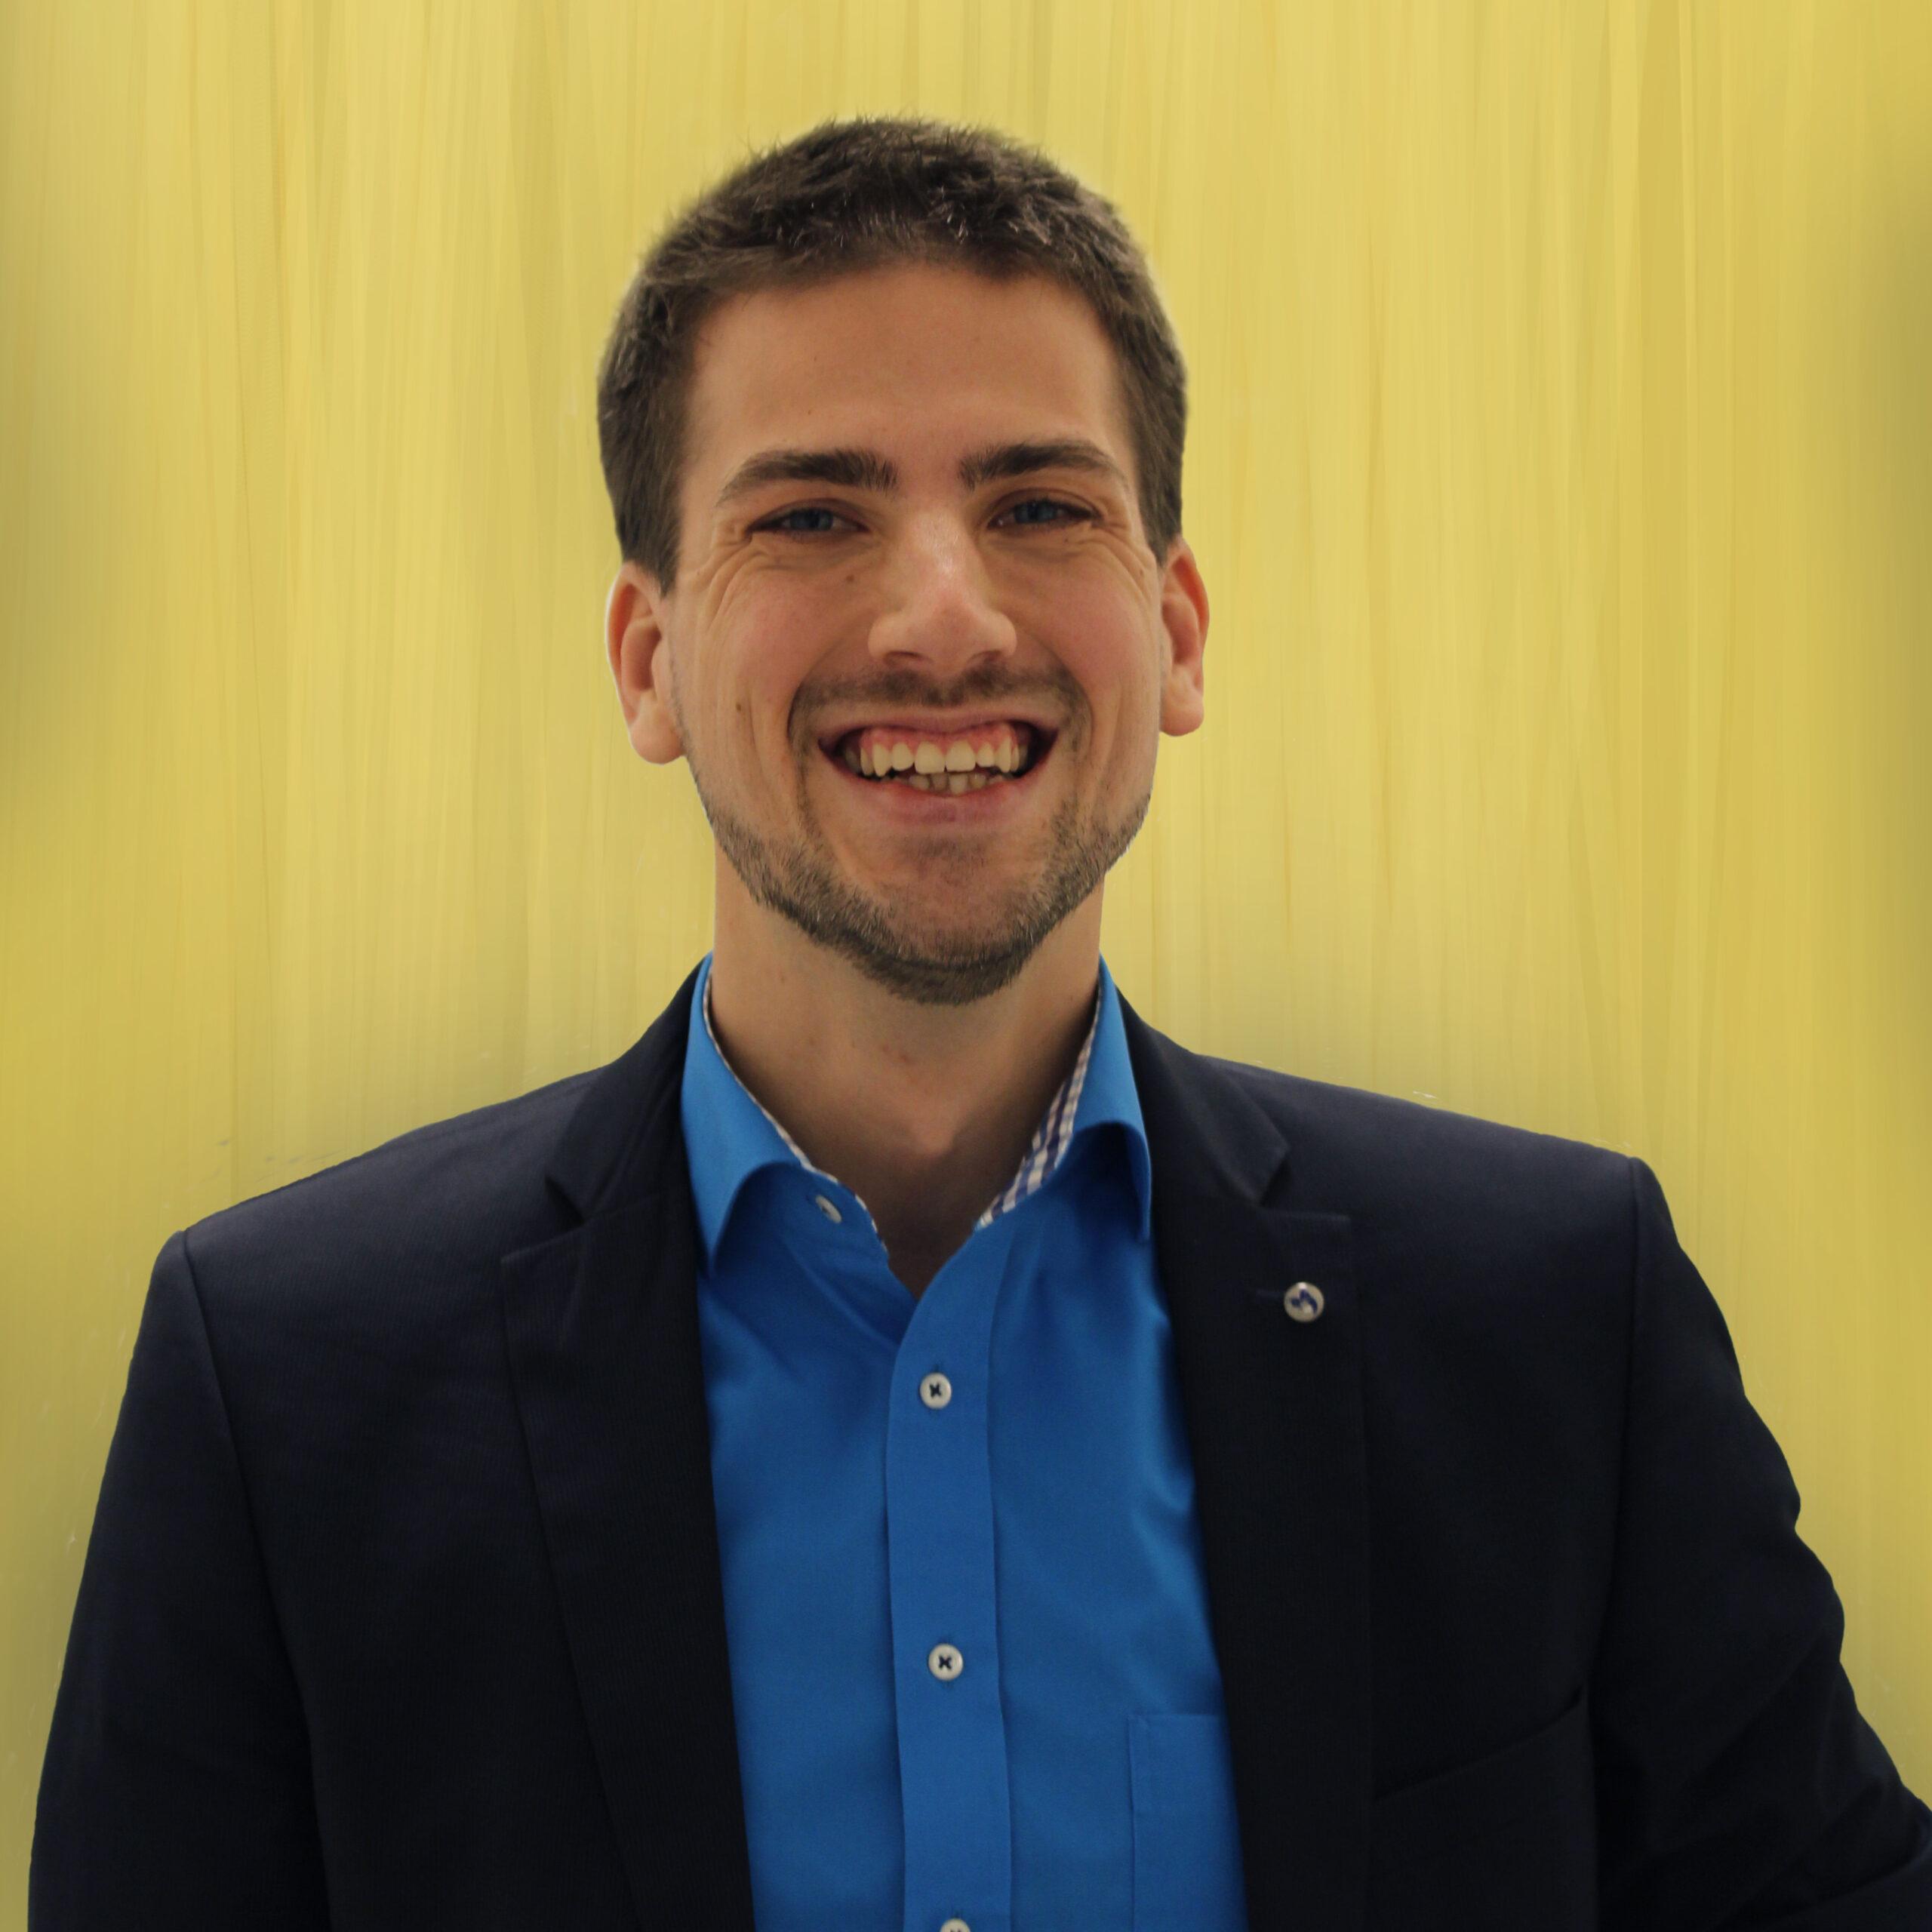 Mag. Matthias Foller